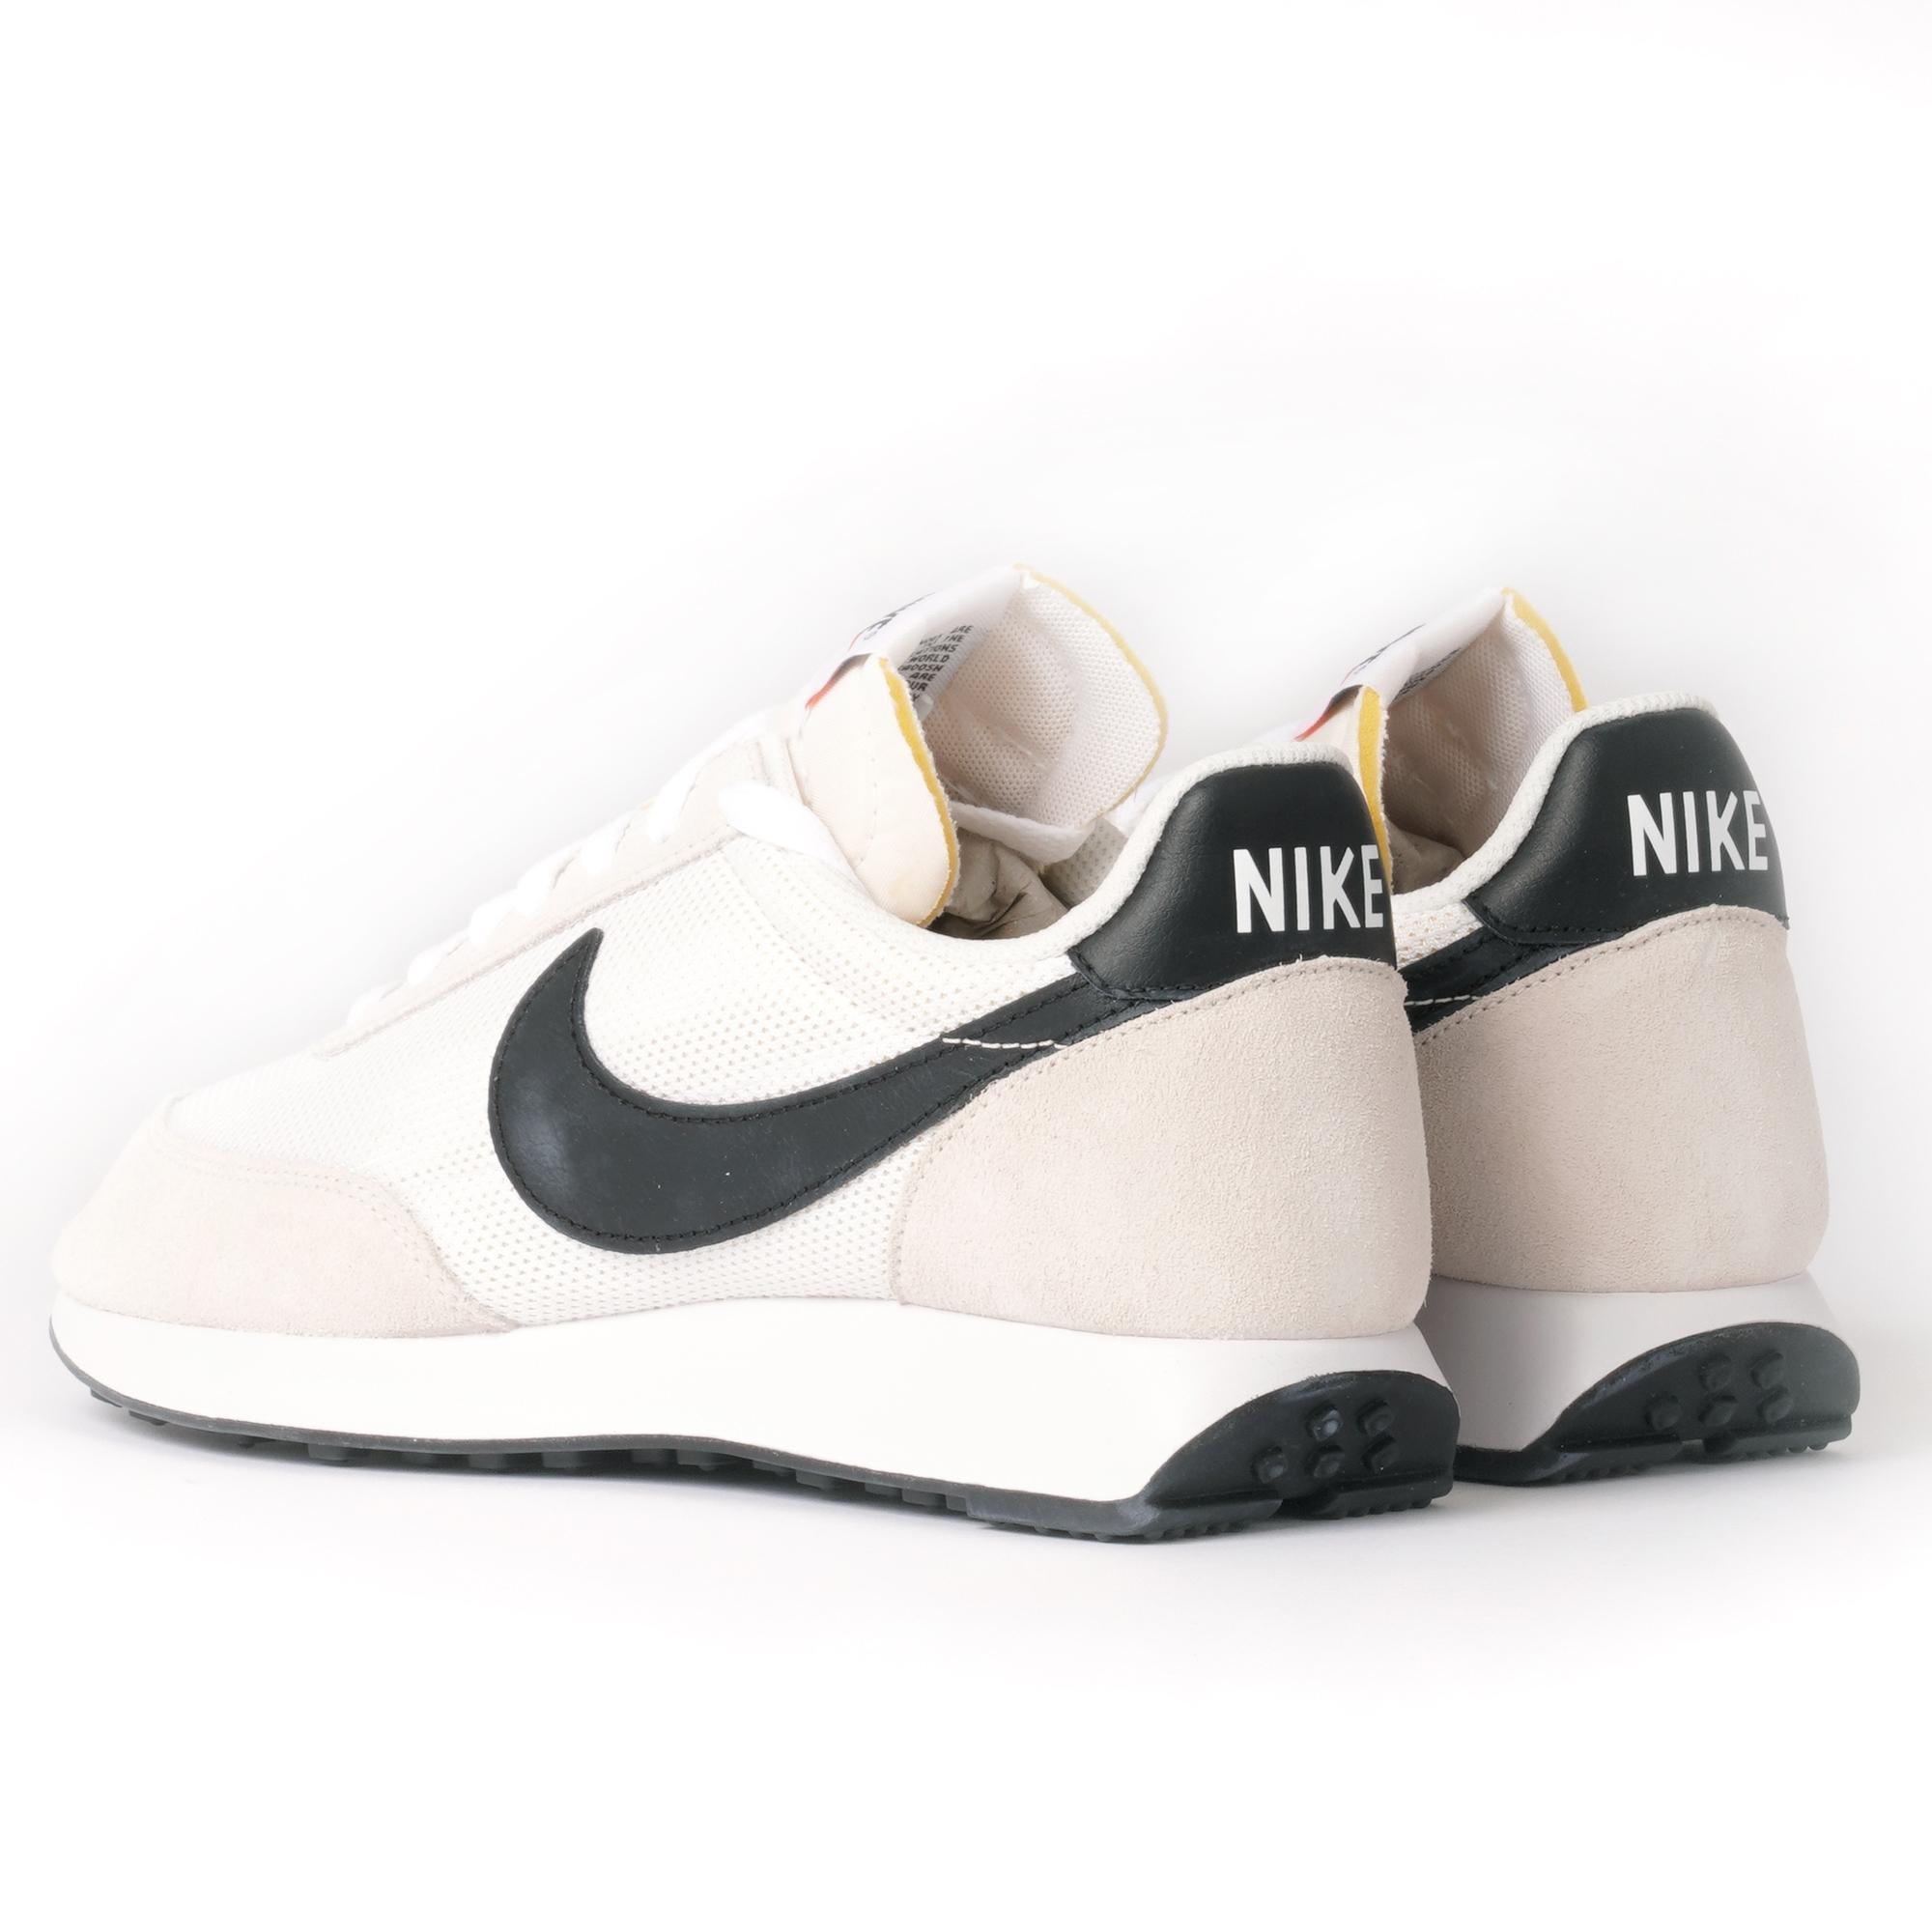 cheaper b79e3 d7e82 Nike Air Tailwind 79 - White, Black, Phantom   Dark Grey in White ...